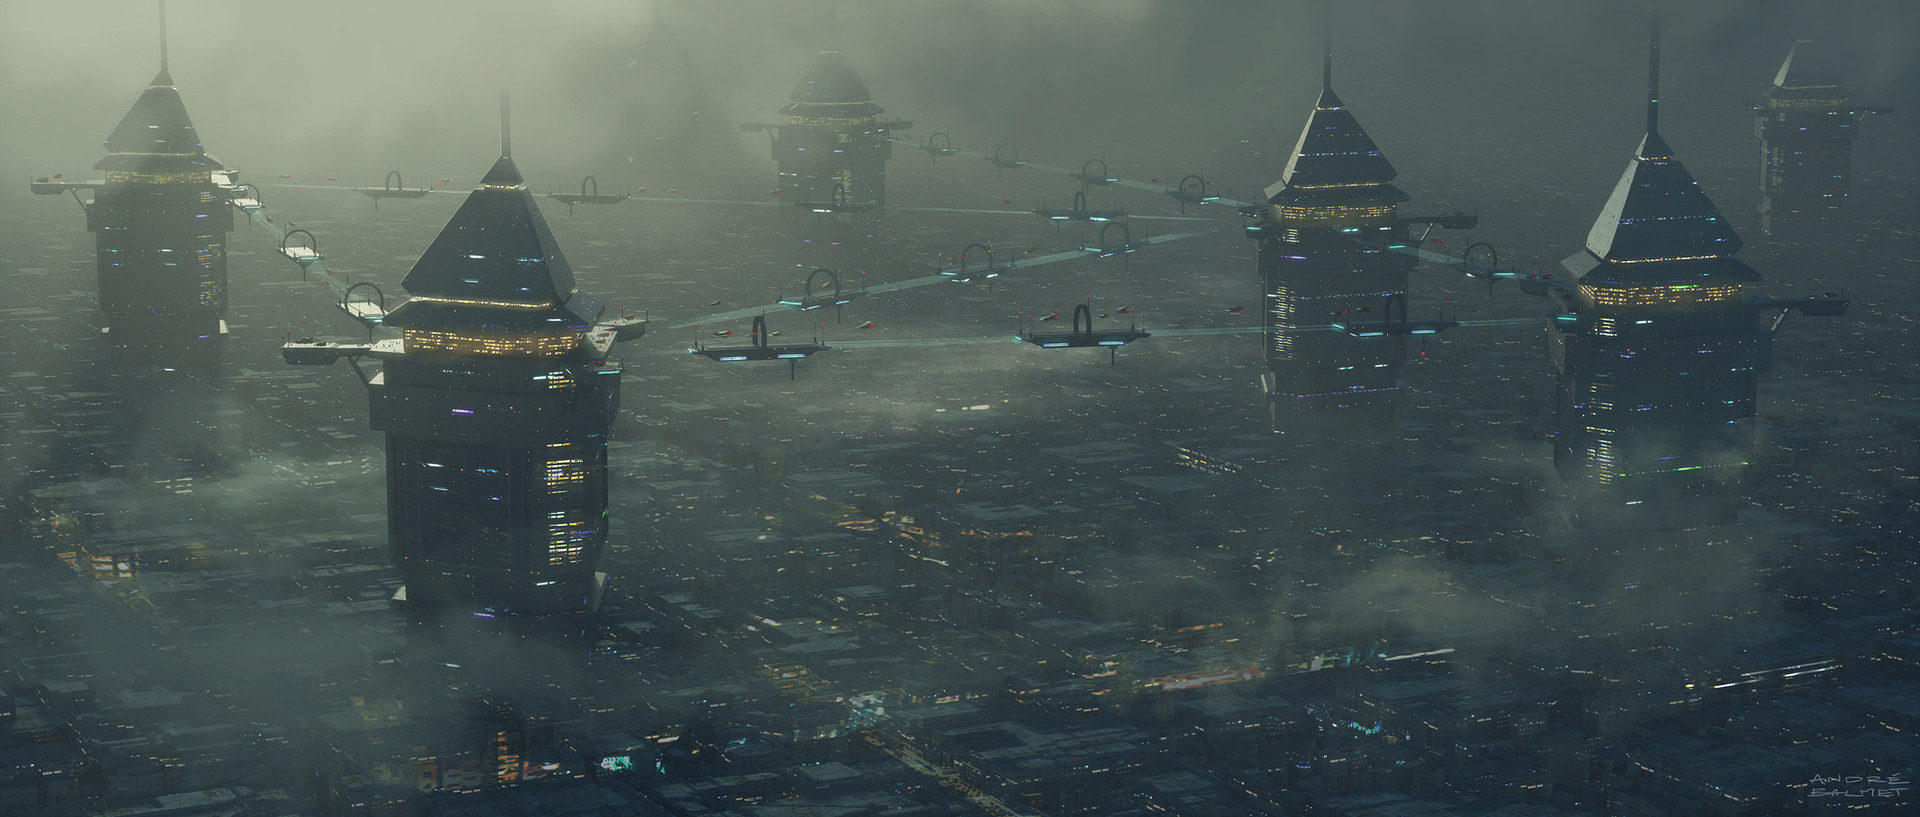 andre-balmet-andrebalmet-citytowers2.jpg